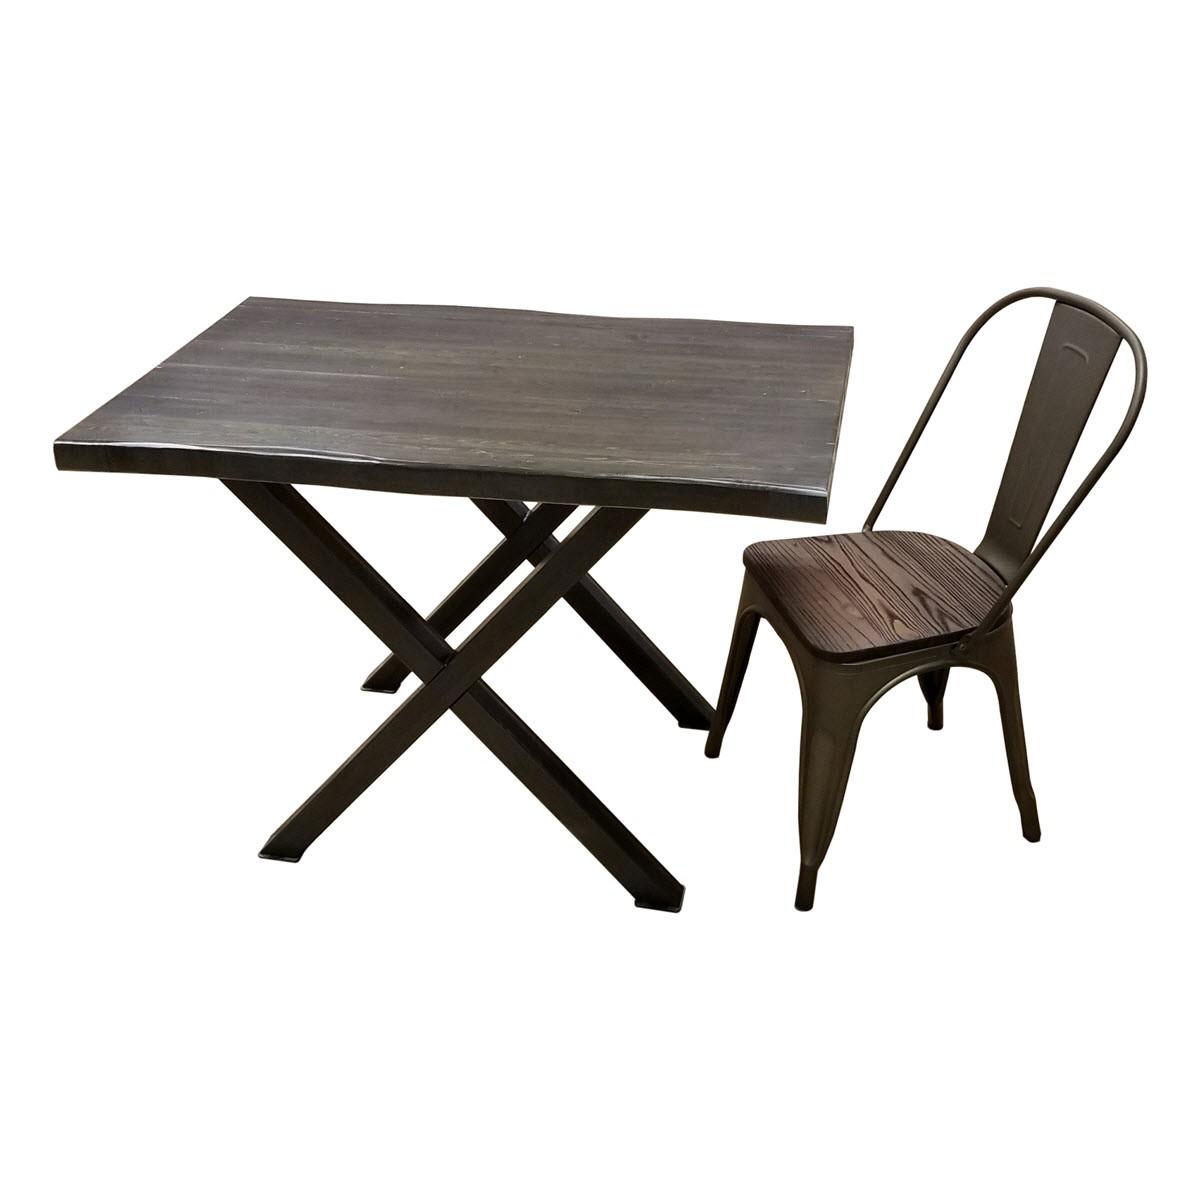 live edge solid wood table tops. Black Bedroom Furniture Sets. Home Design Ideas